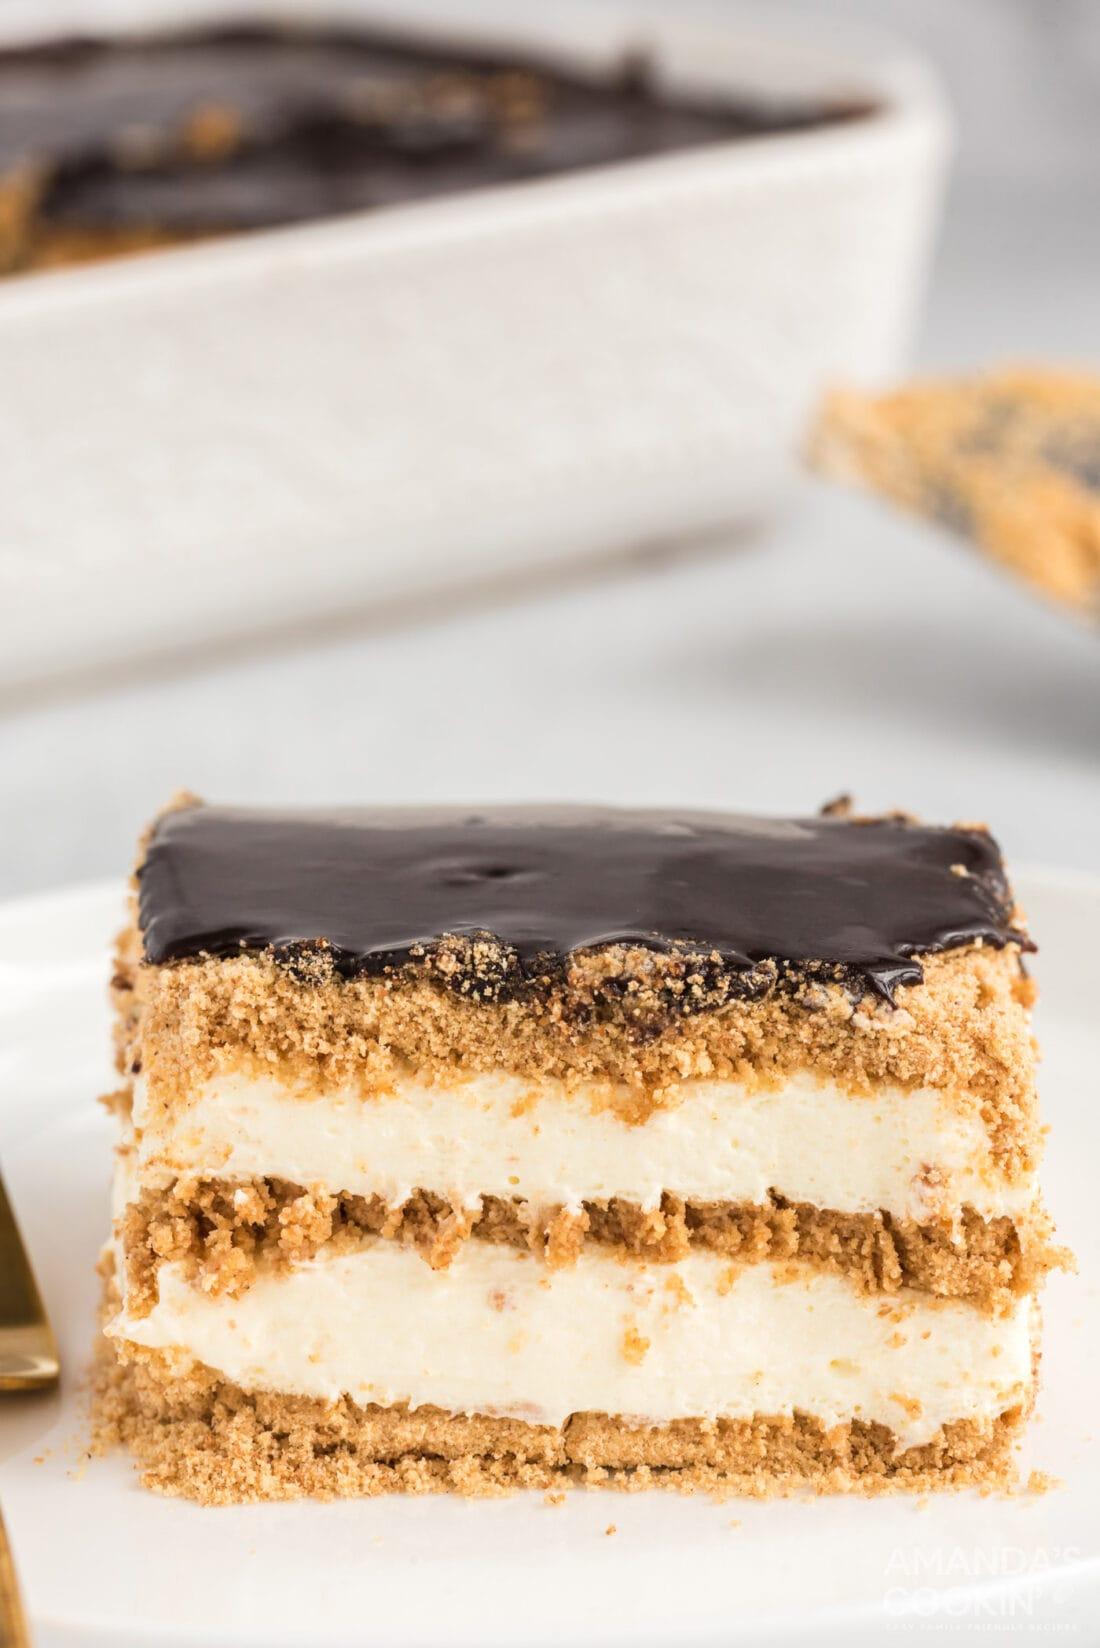 slice of eclair cake